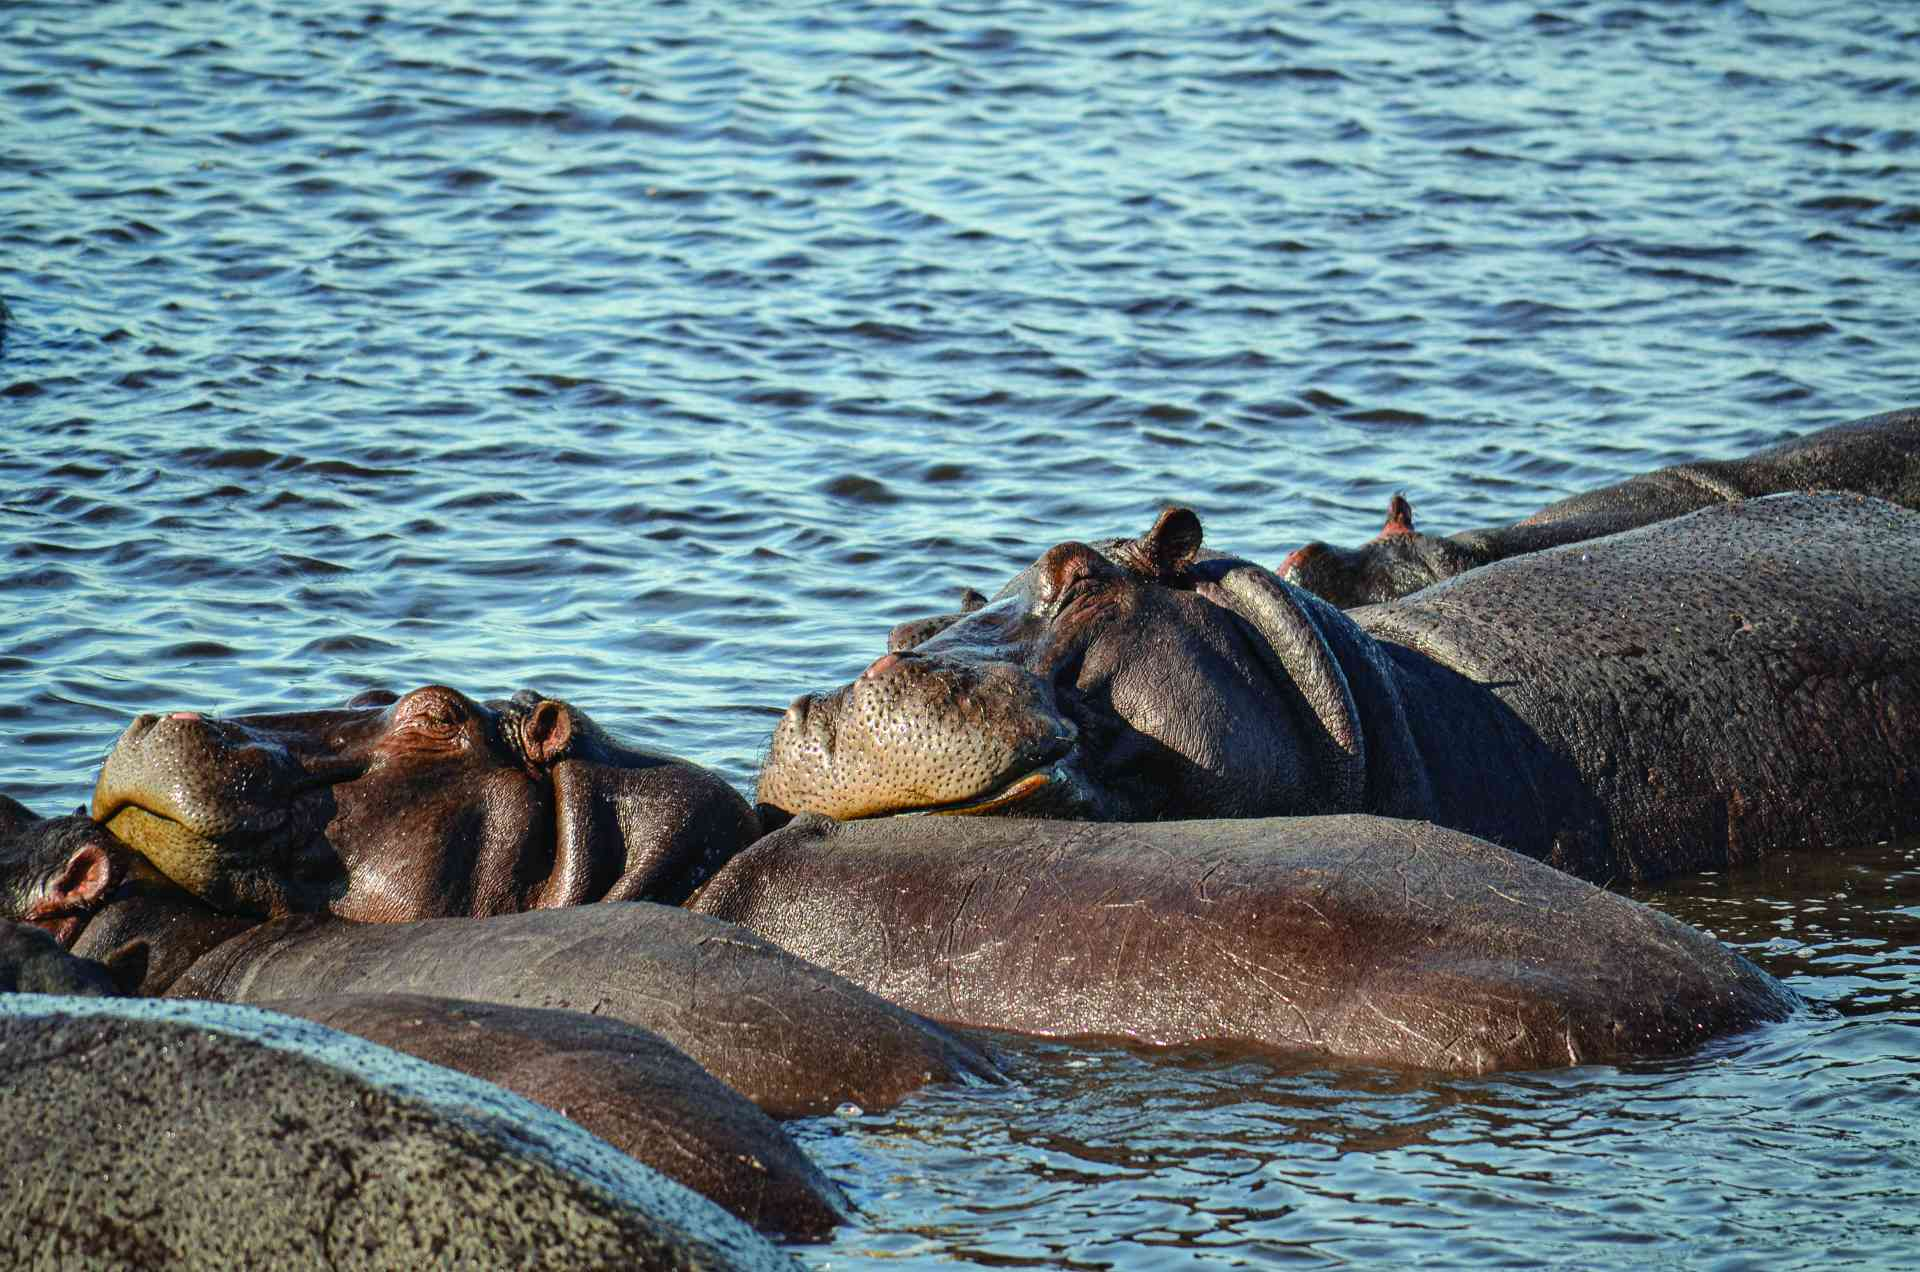 Chobe National Park, Botswana by Annelieke Huijgens